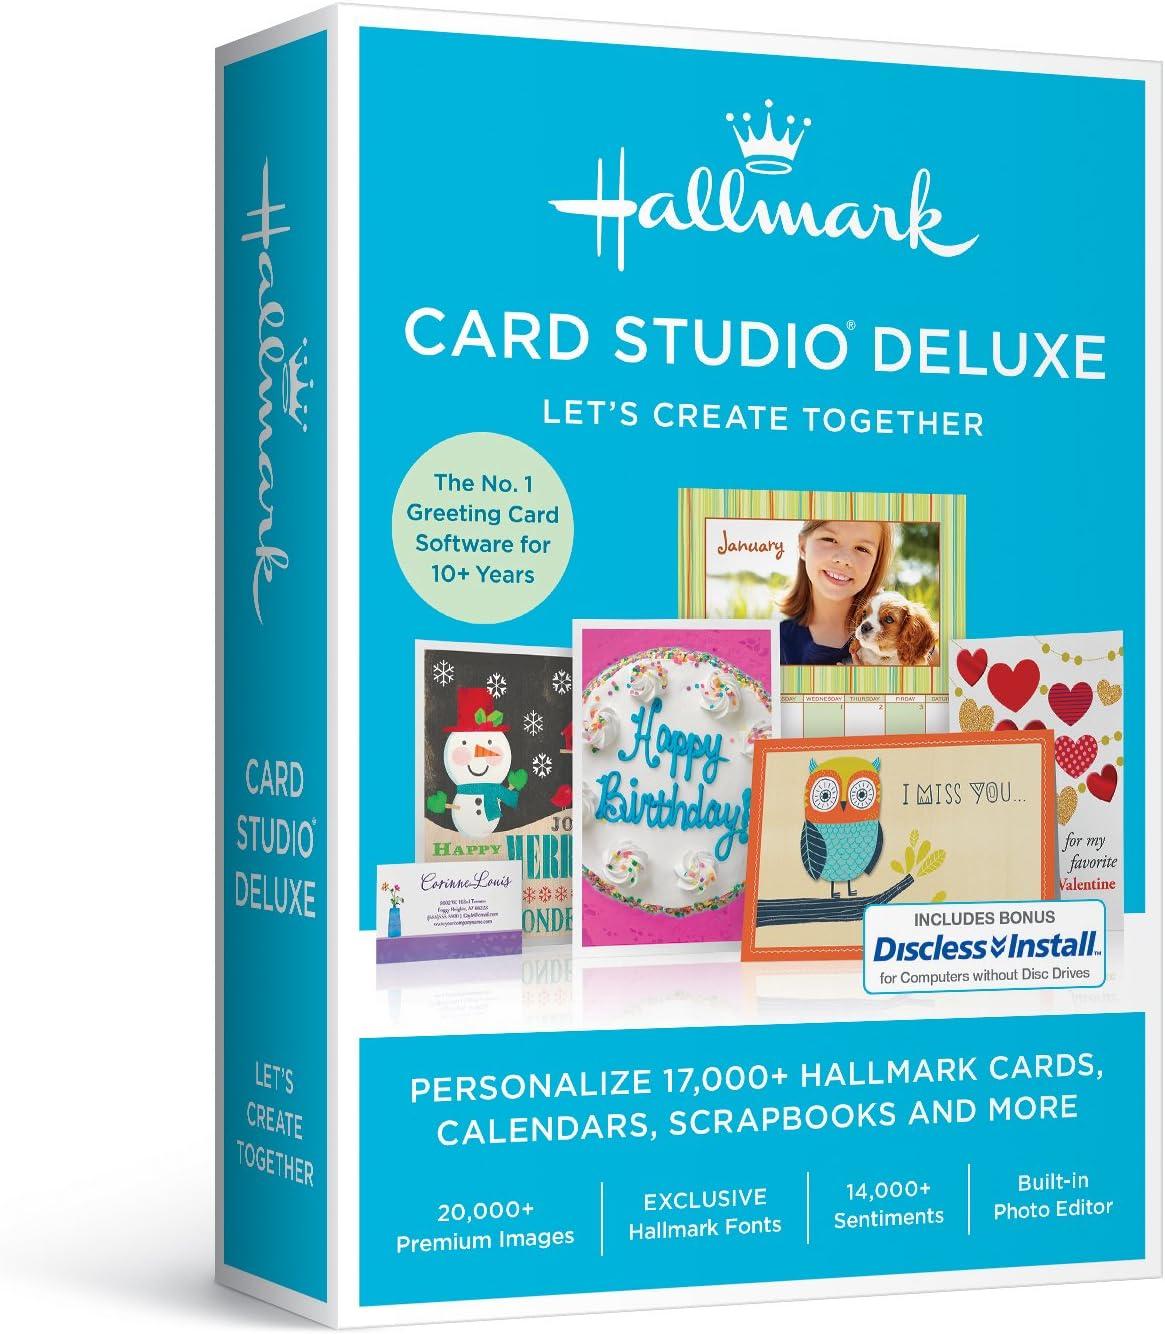 B01JHQXFWM Nova Development US Hallmark Card Studio Deluxe 2017 2017 - Old Version 7112bqvQG1L